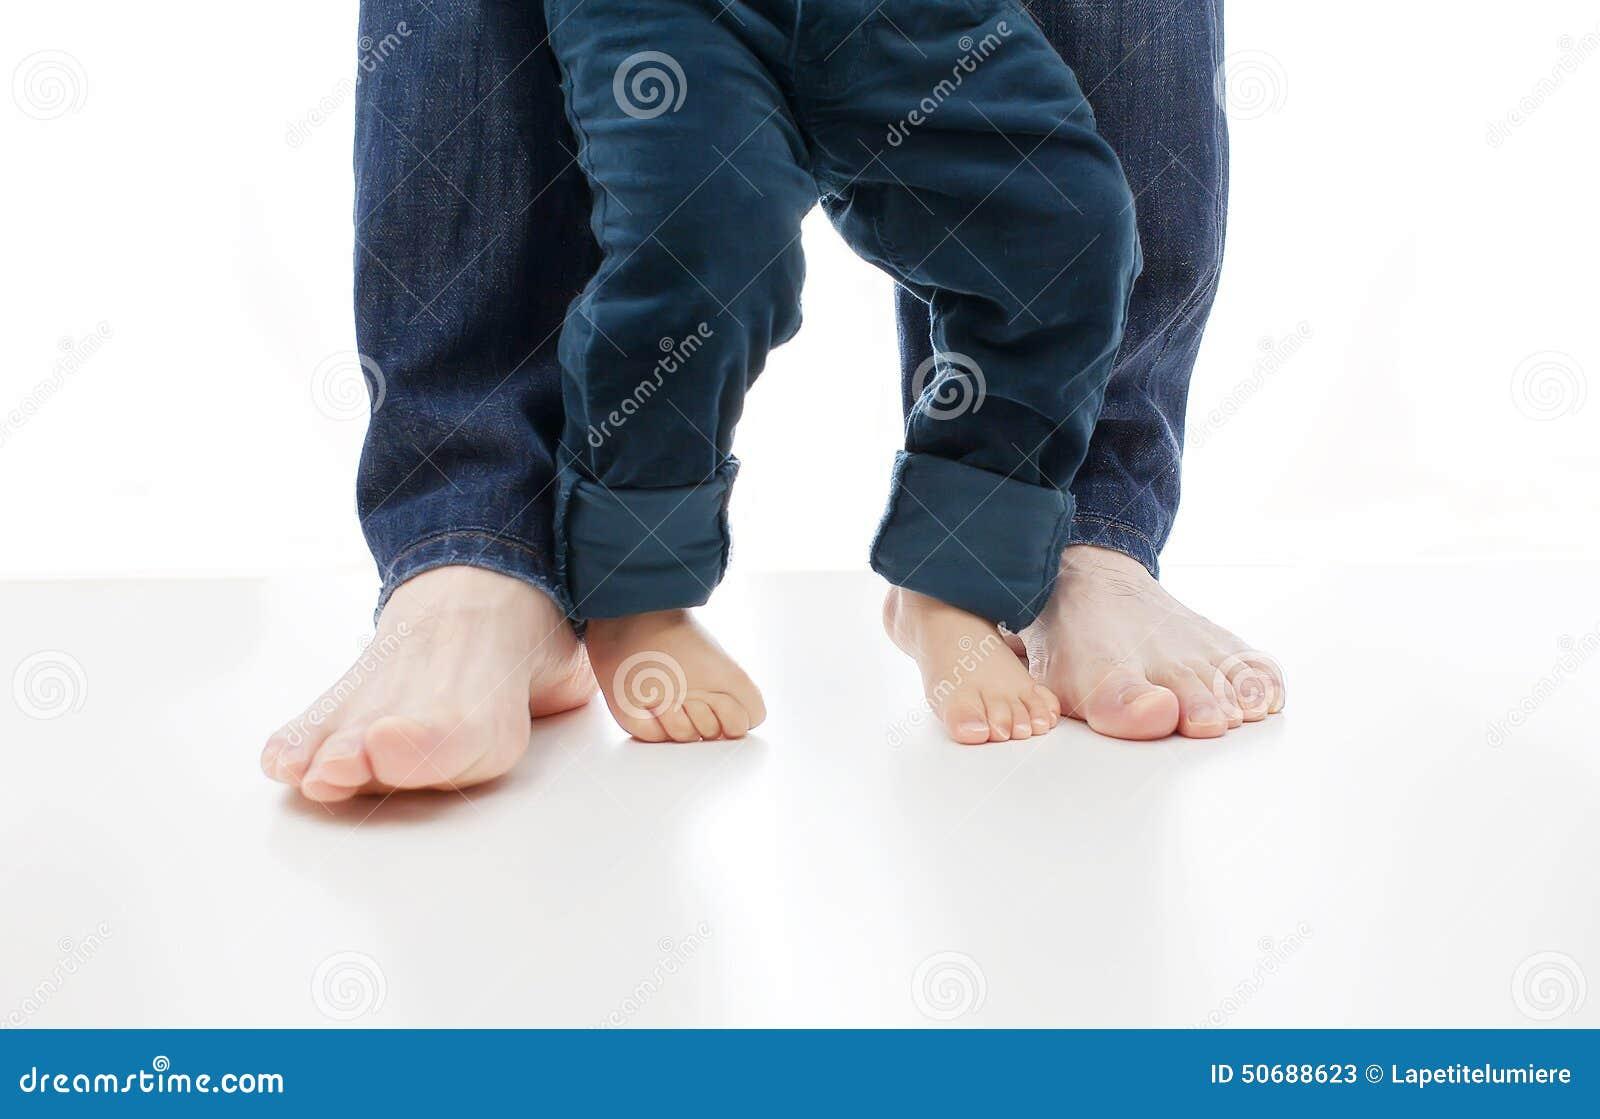 Download 一个婴孩学会一起走与父亲在白色,他们的脚赤裸 库存图片. 图片 包括有 英尺, 生活, 首先, 一次性, 婴儿 - 50688623